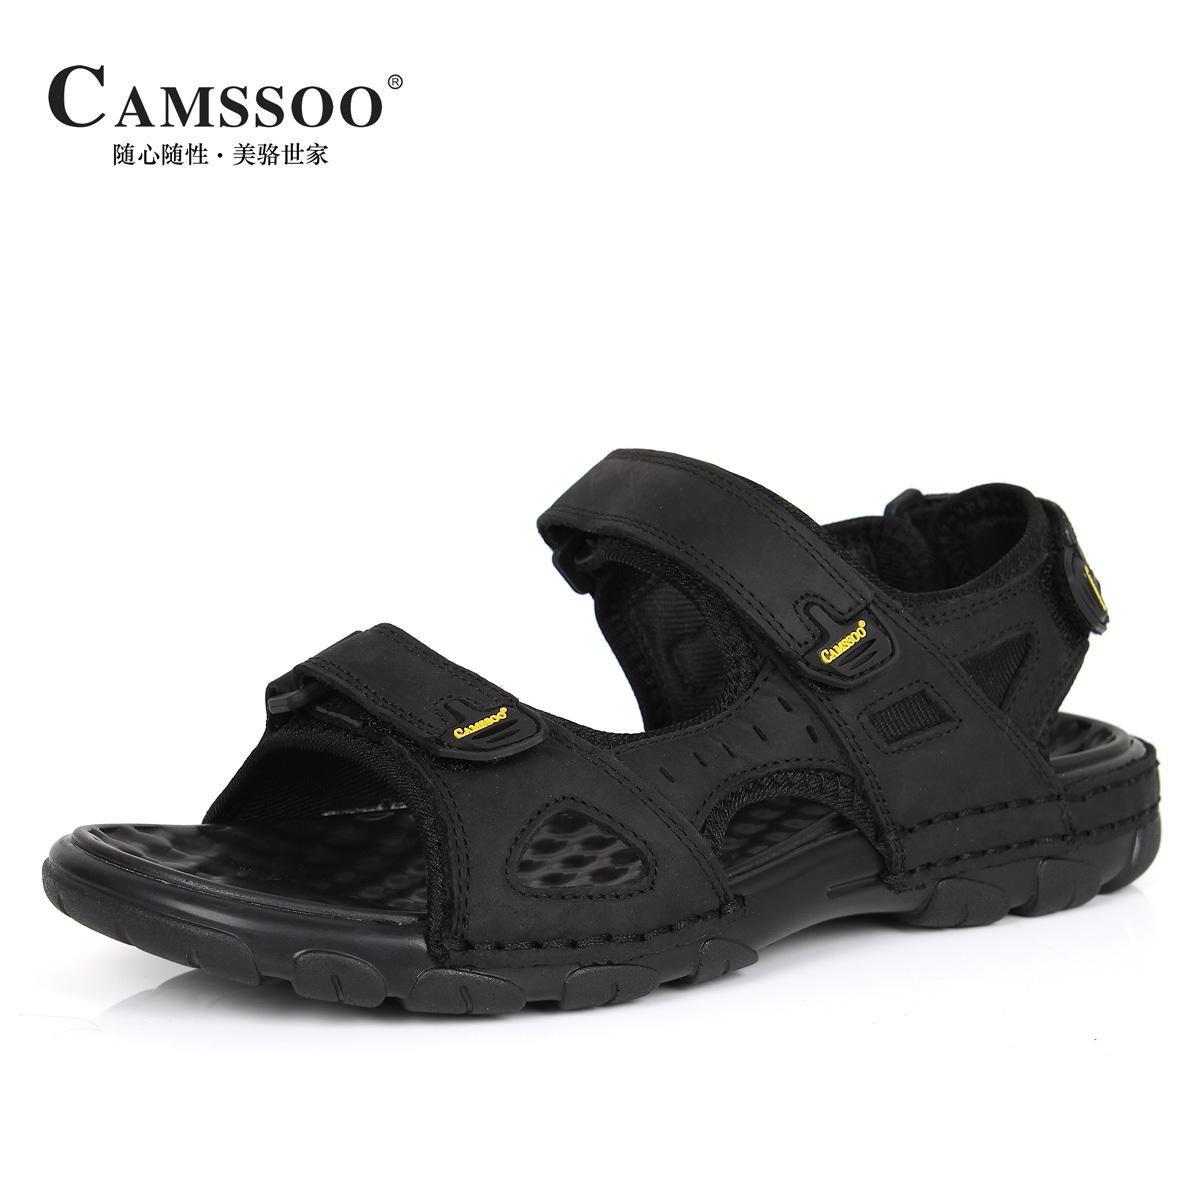 Кроксы Camssoo lh2051 368 Camssoo / America Luo family Китай Мужчины